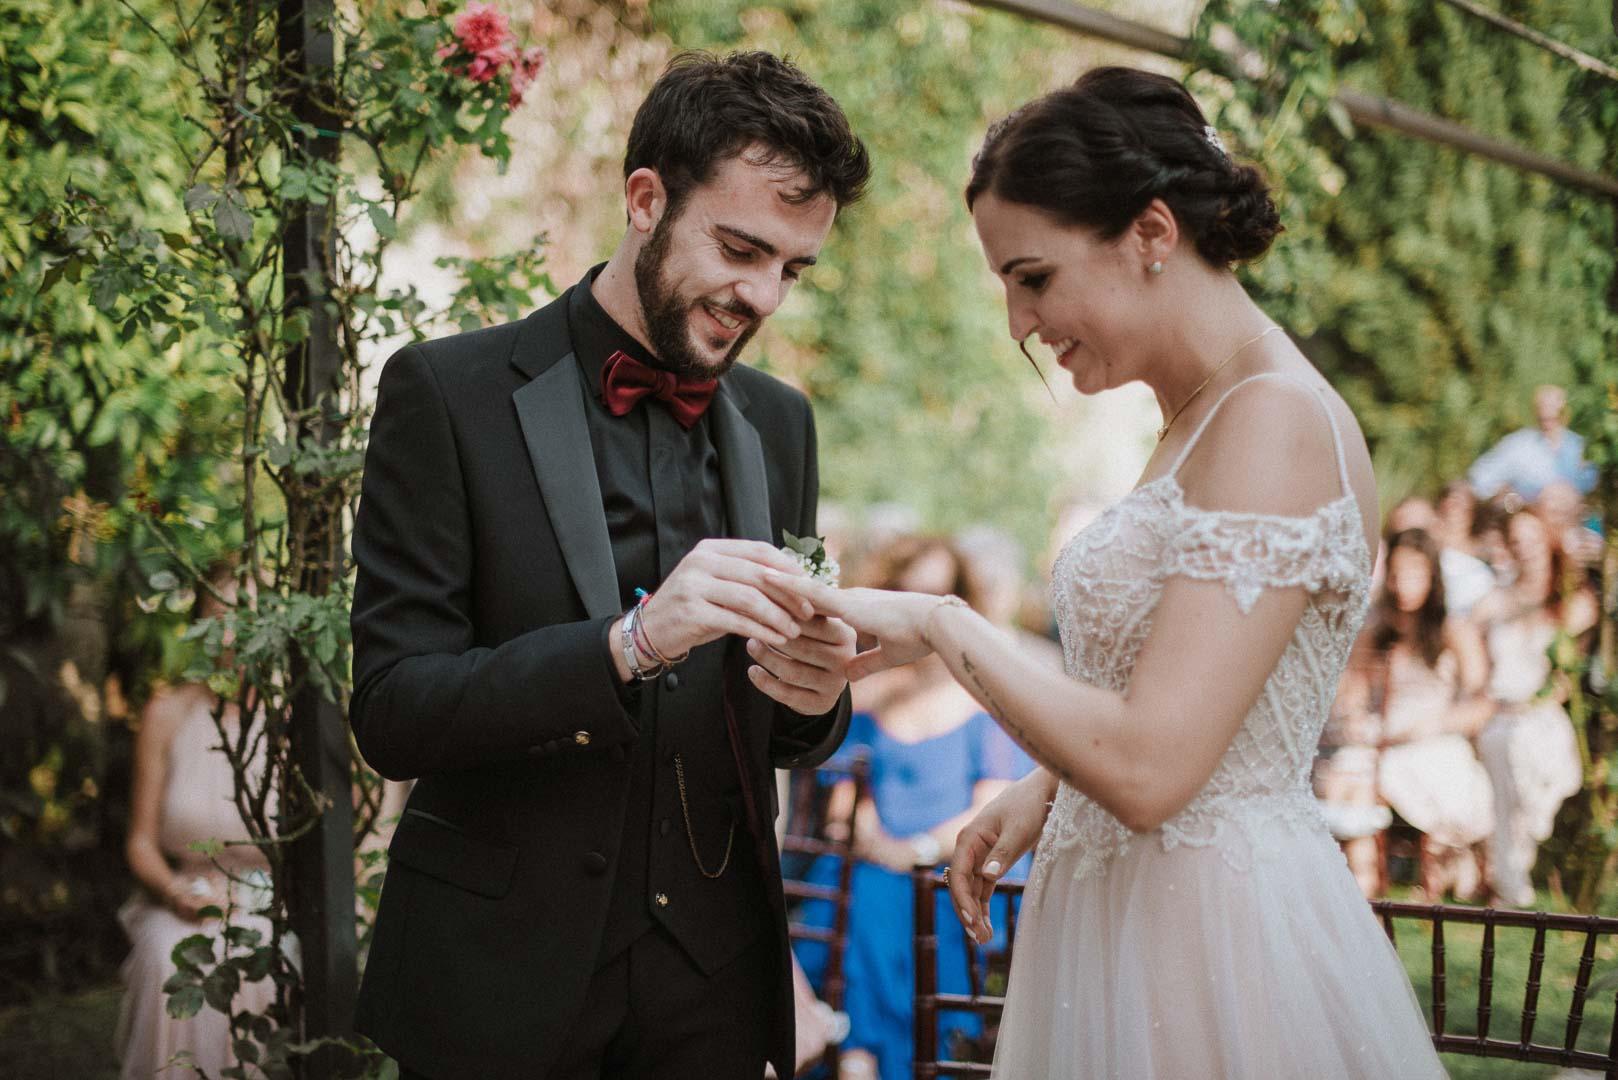 wedding-photographer-destination-fineart-bespoke-reportage-tuscany-villascorzi-vivianeizzo-spazio46-73